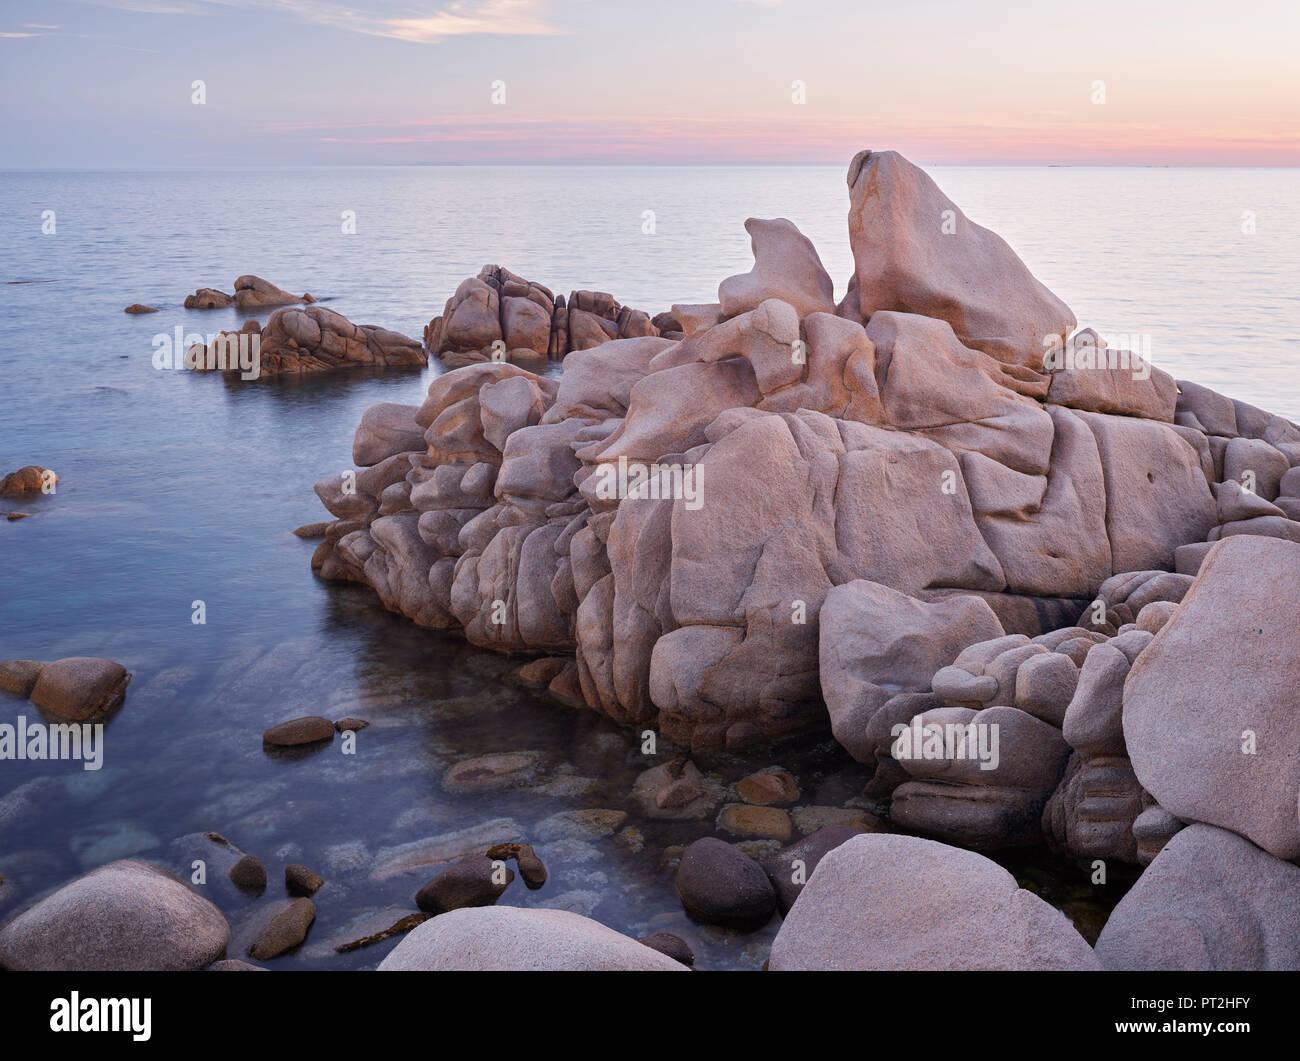 Las formaciones rocosas de la reserva de naturaleza Bruzzi, cerca Pianottoli-Caldarello, Corse du Sud, Córcega, Francia Imagen De Stock